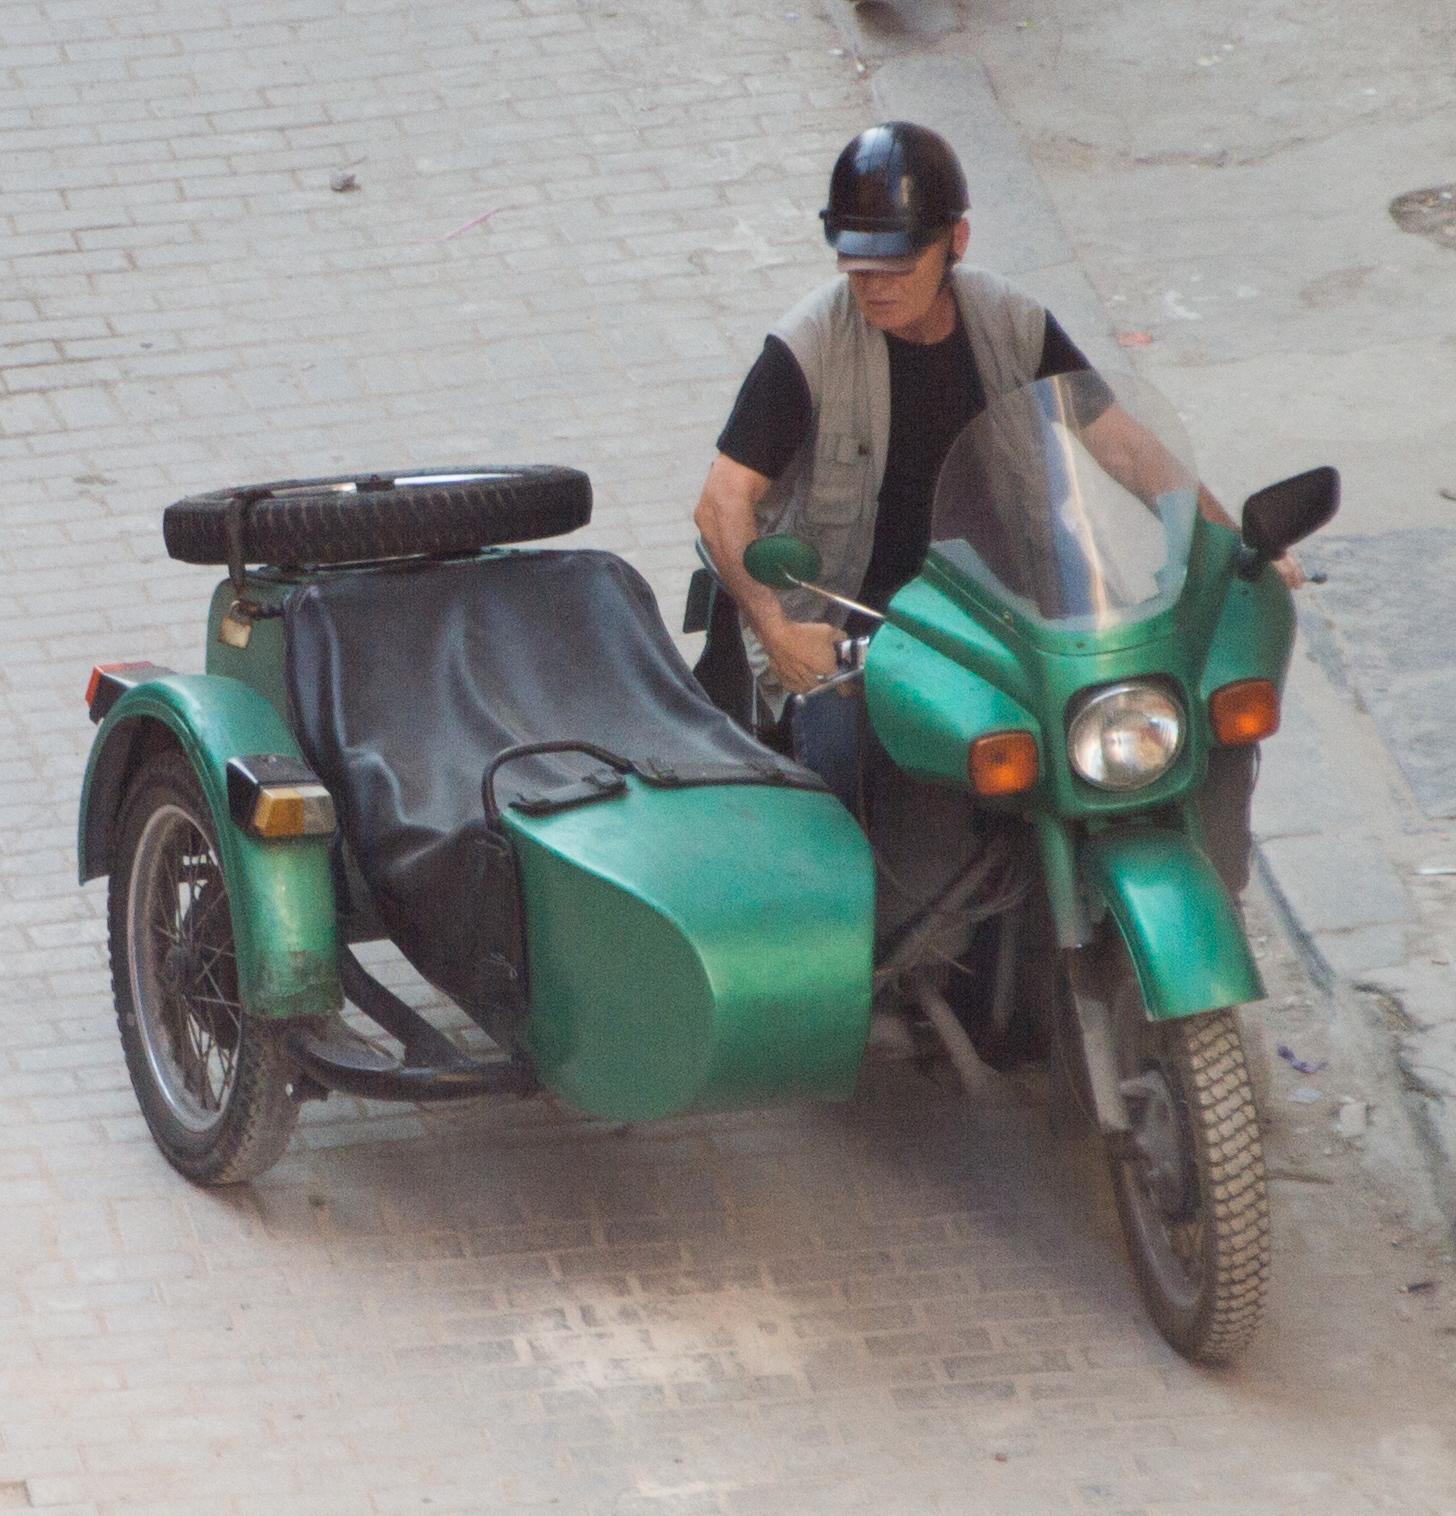 Habana sidecar russo